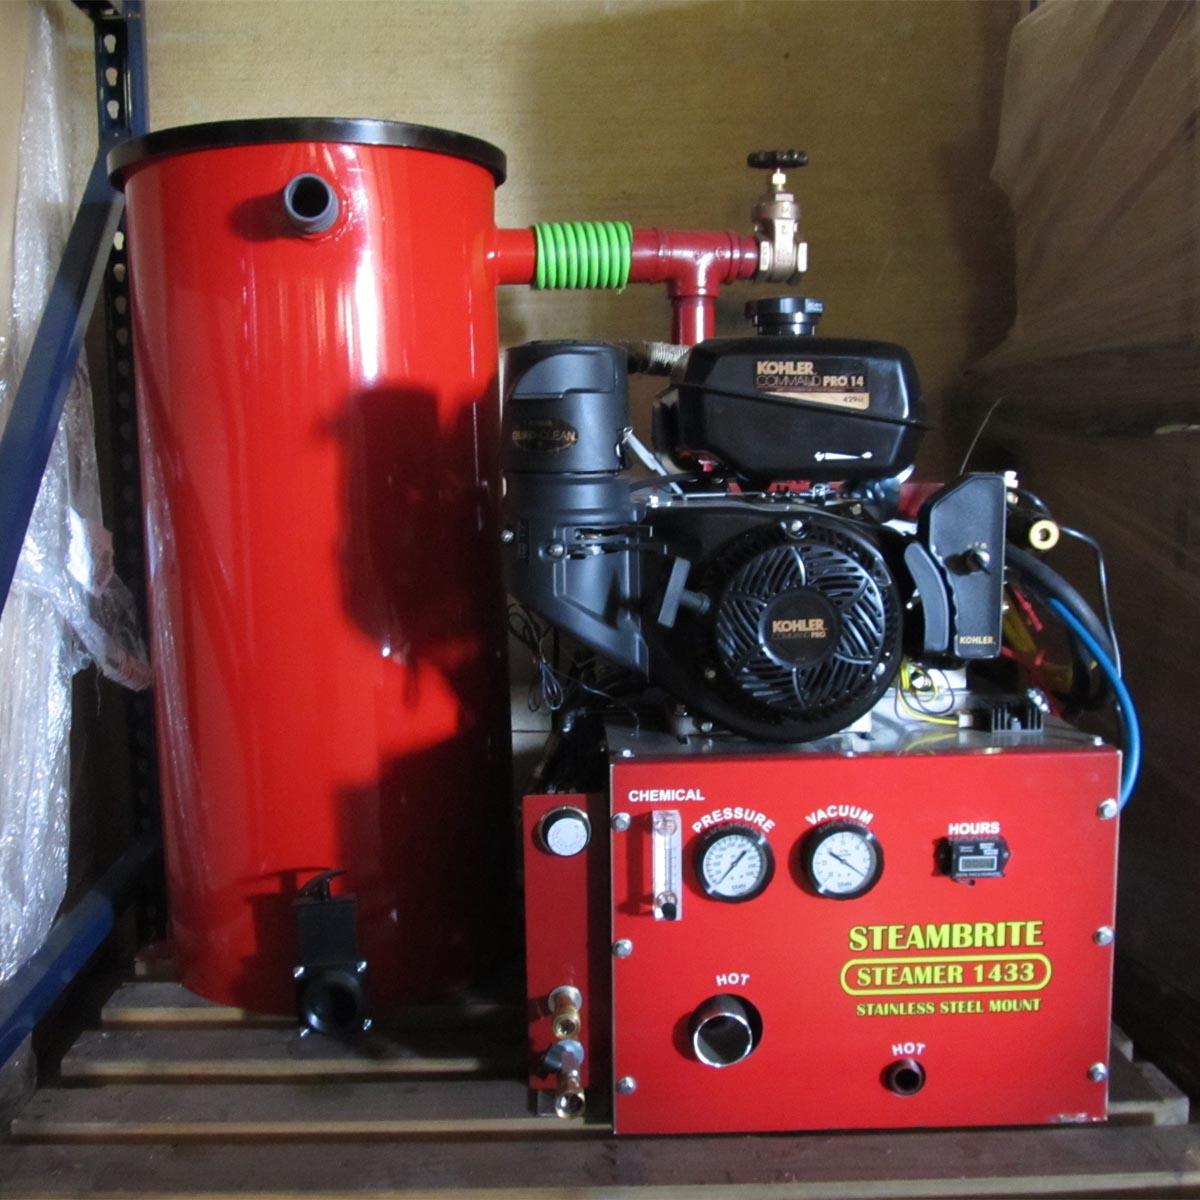 Steambrite 16hp Tm1633b Briggs 33 Truckmount Carpet